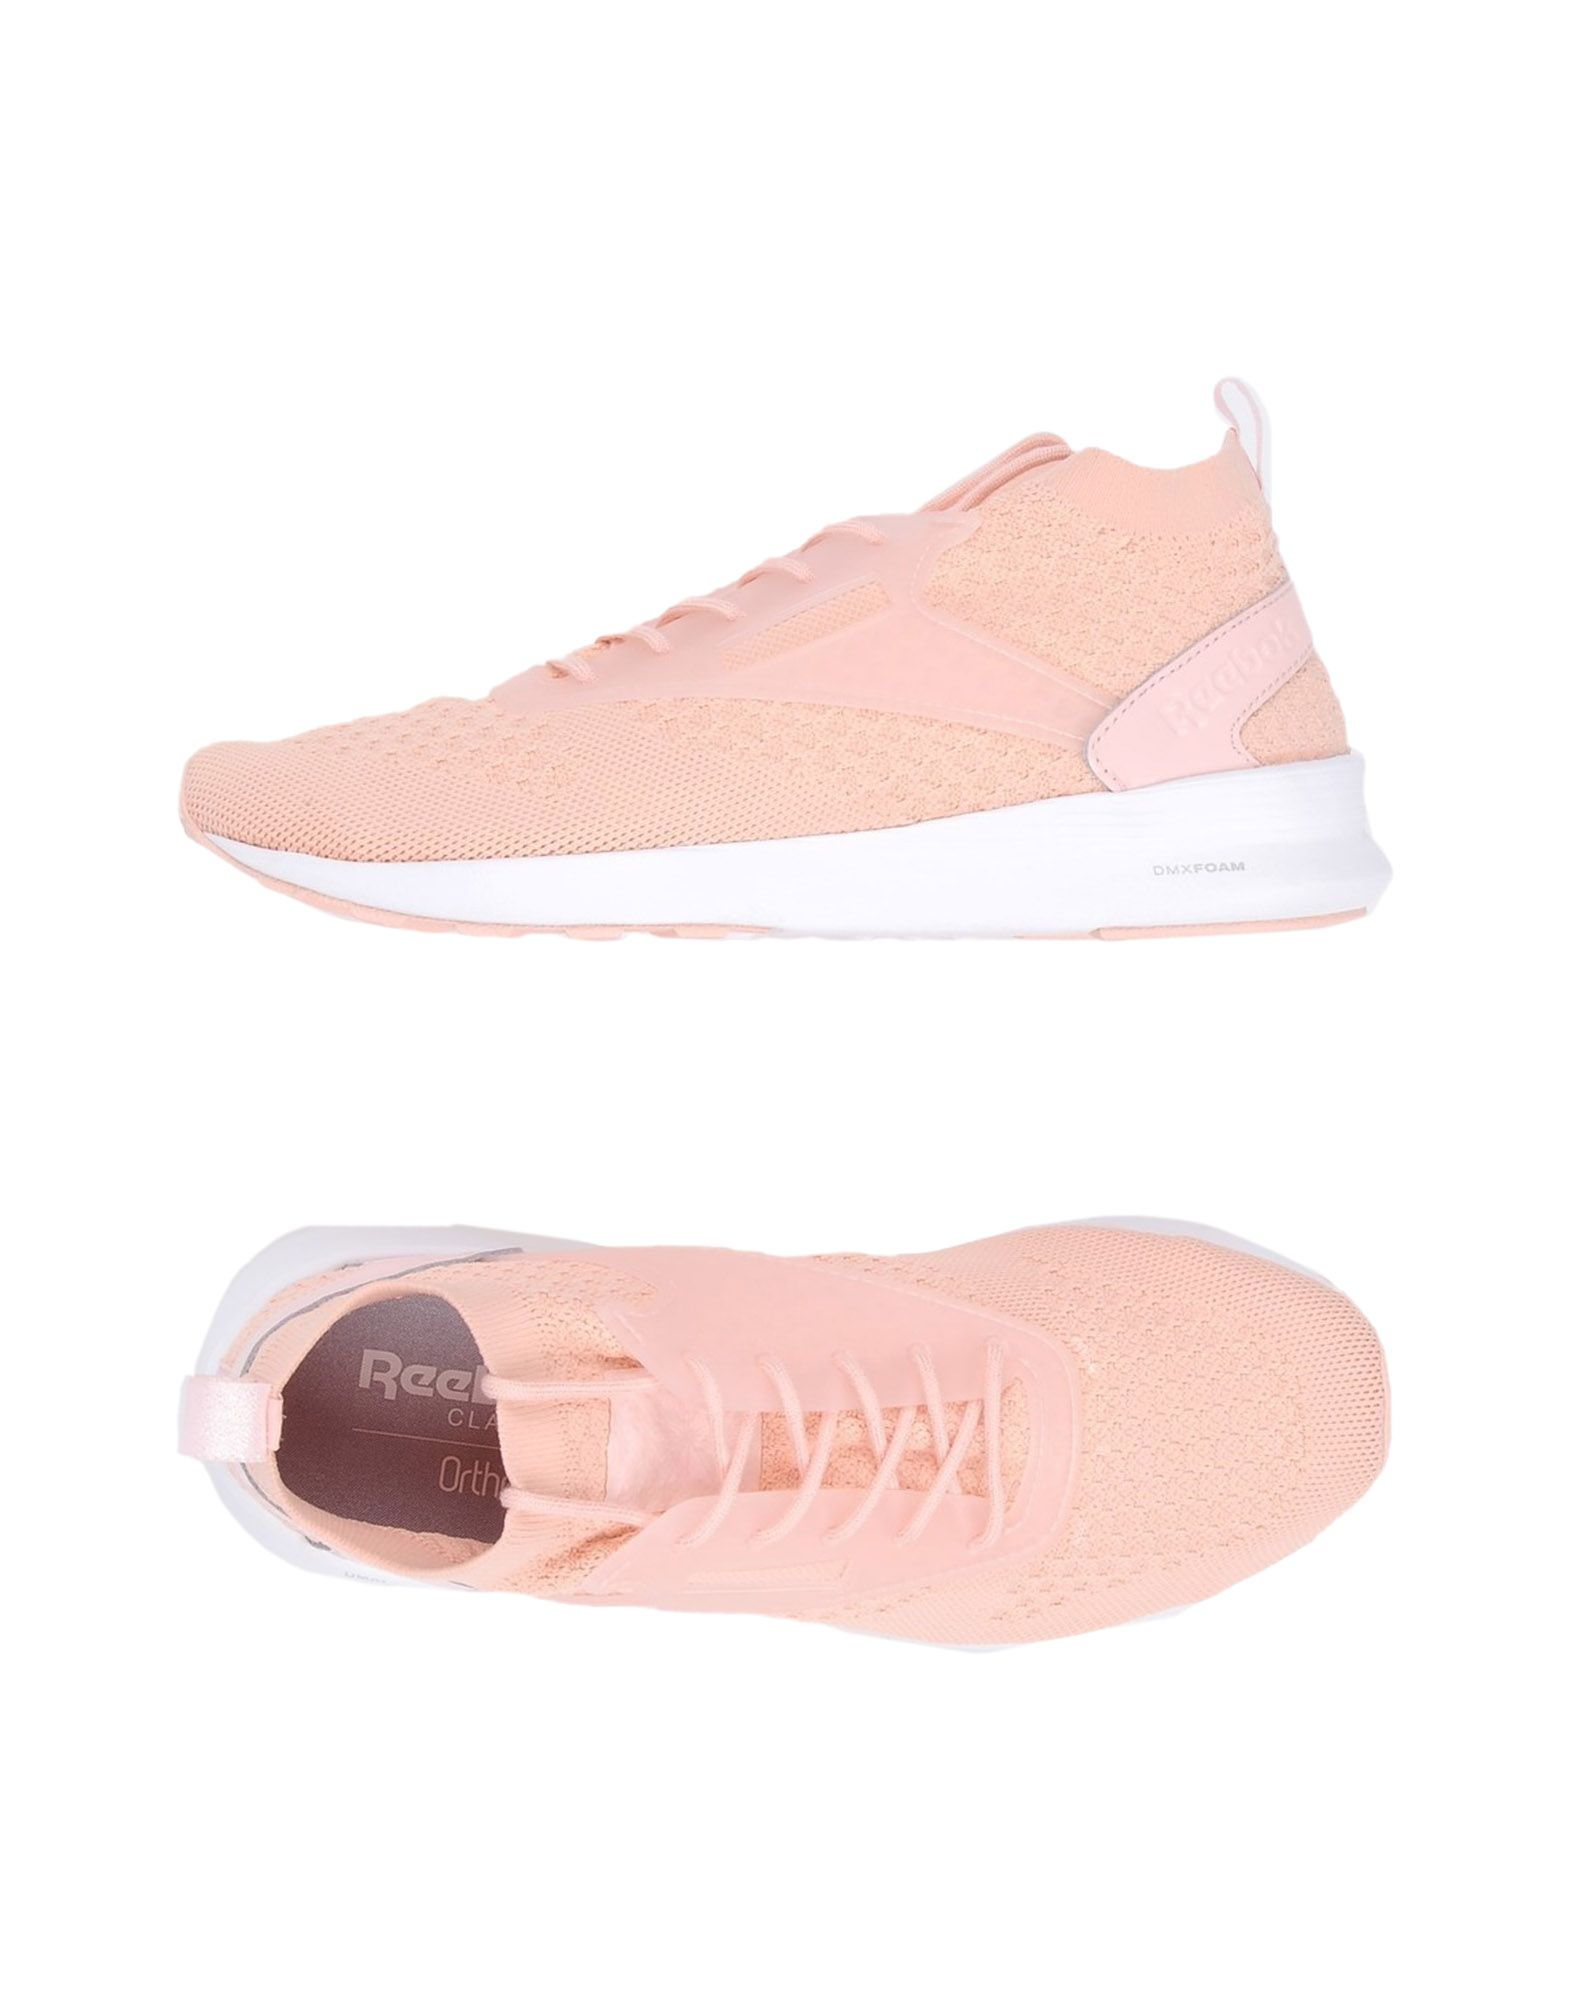 Sneakers Reebok Zoku Runner Ultk Me - Donna - 11280175NQ